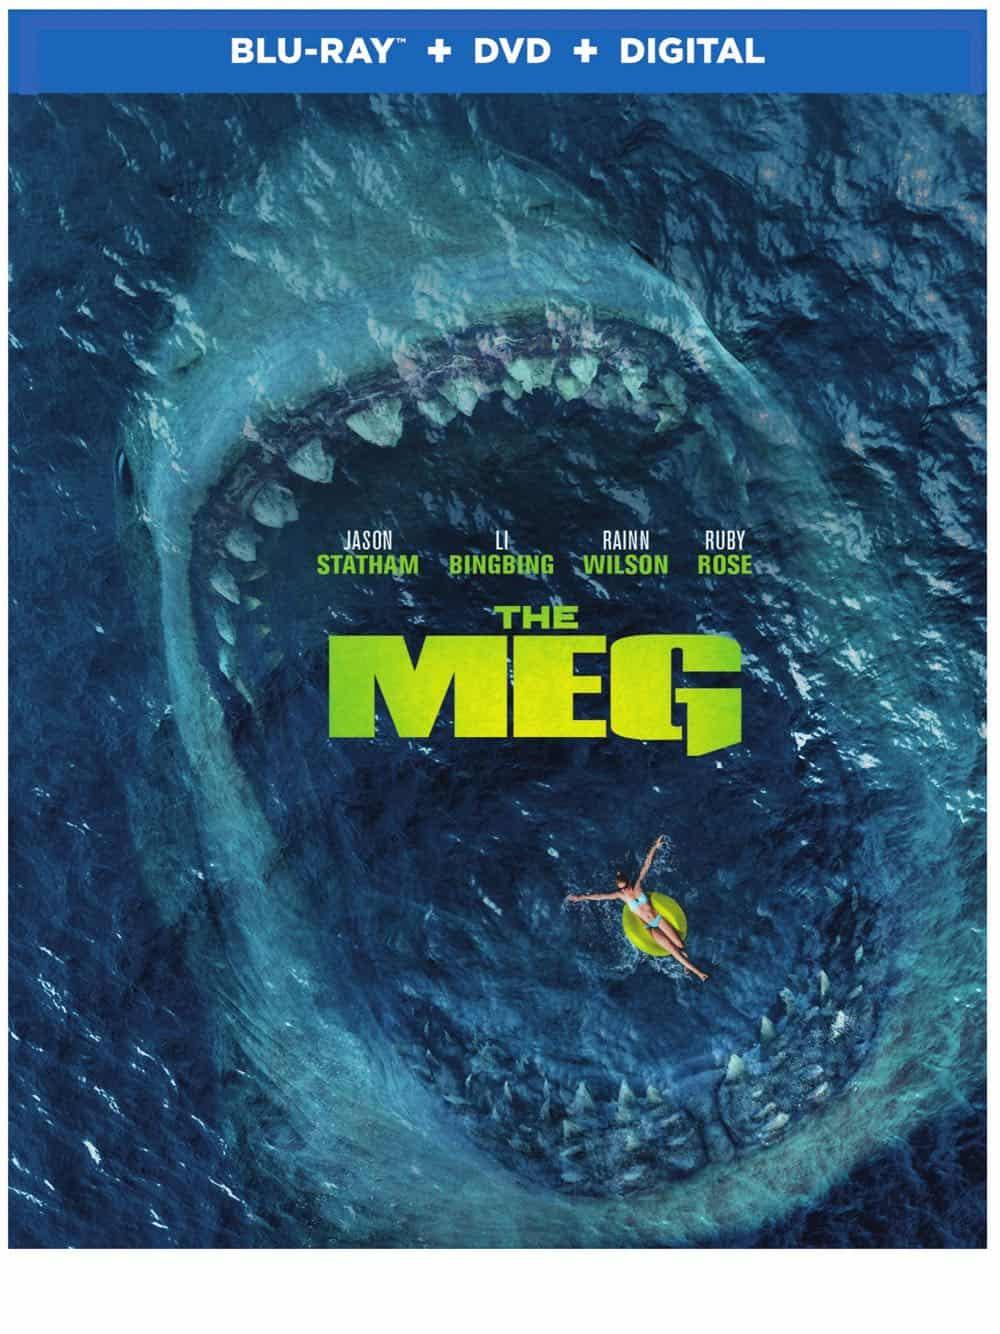 The Meg Bluray DVD Digital 1